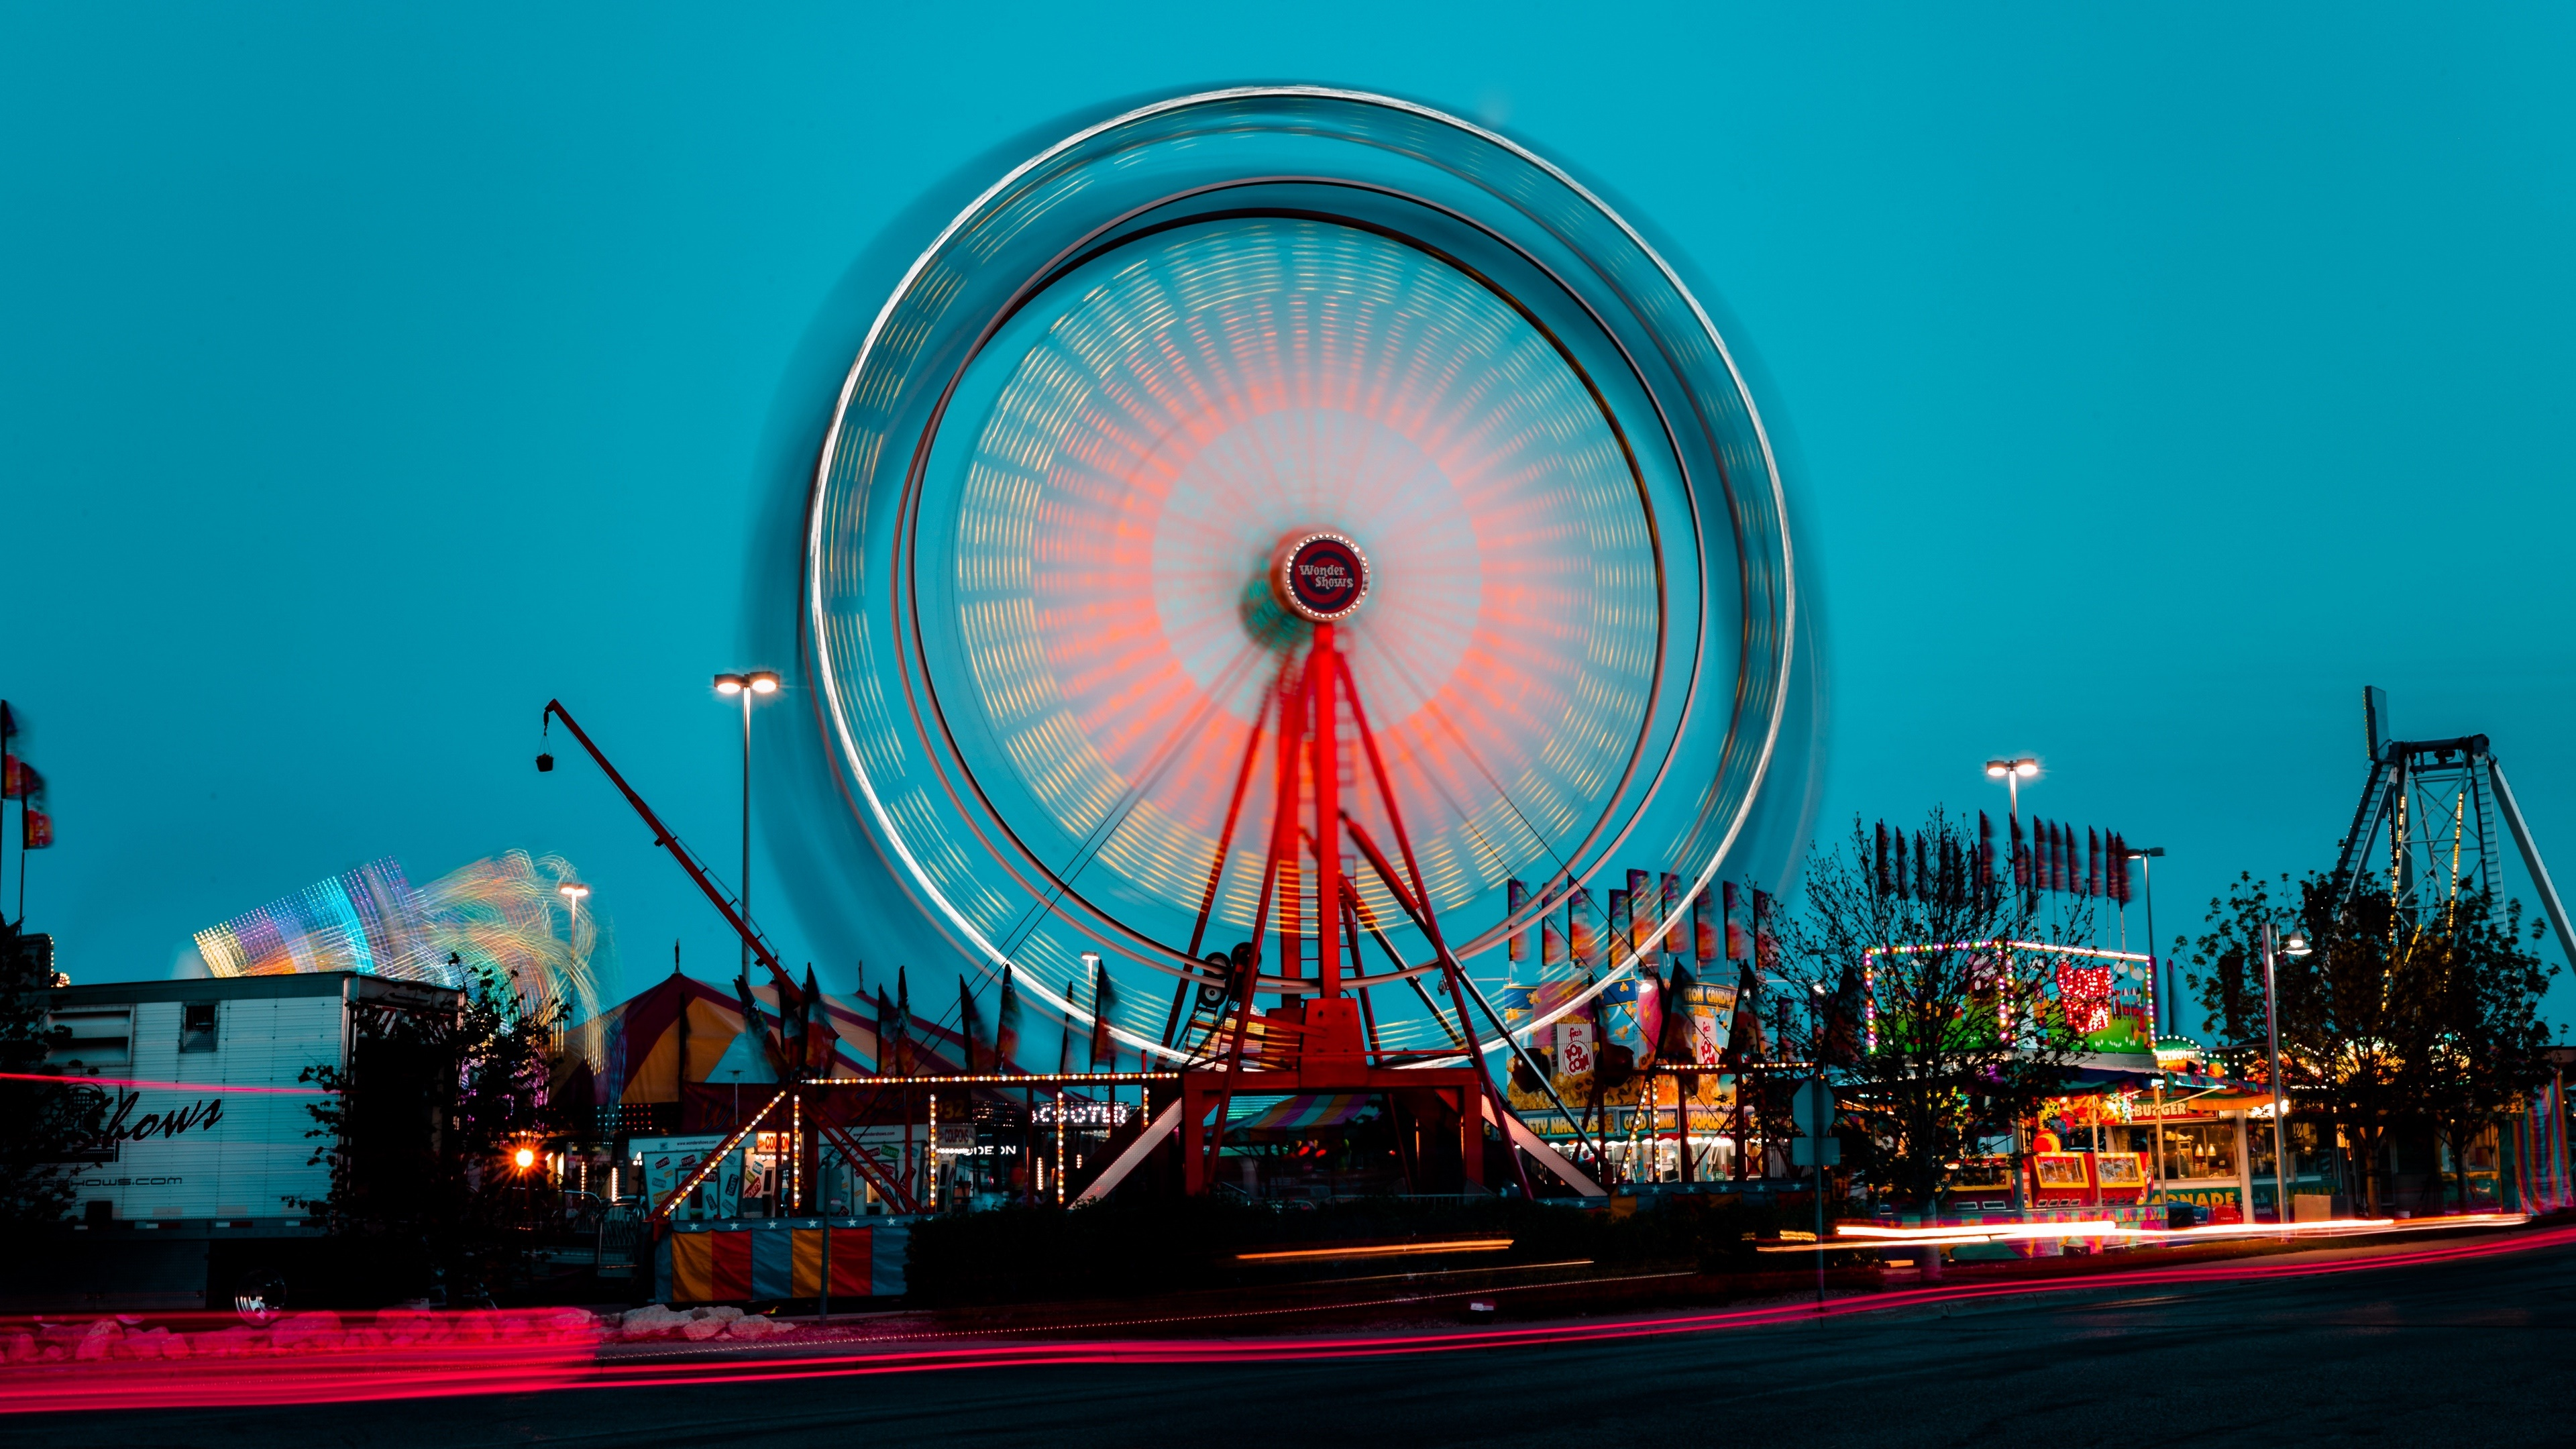 Ferris wheel long exposure photography wallpaper